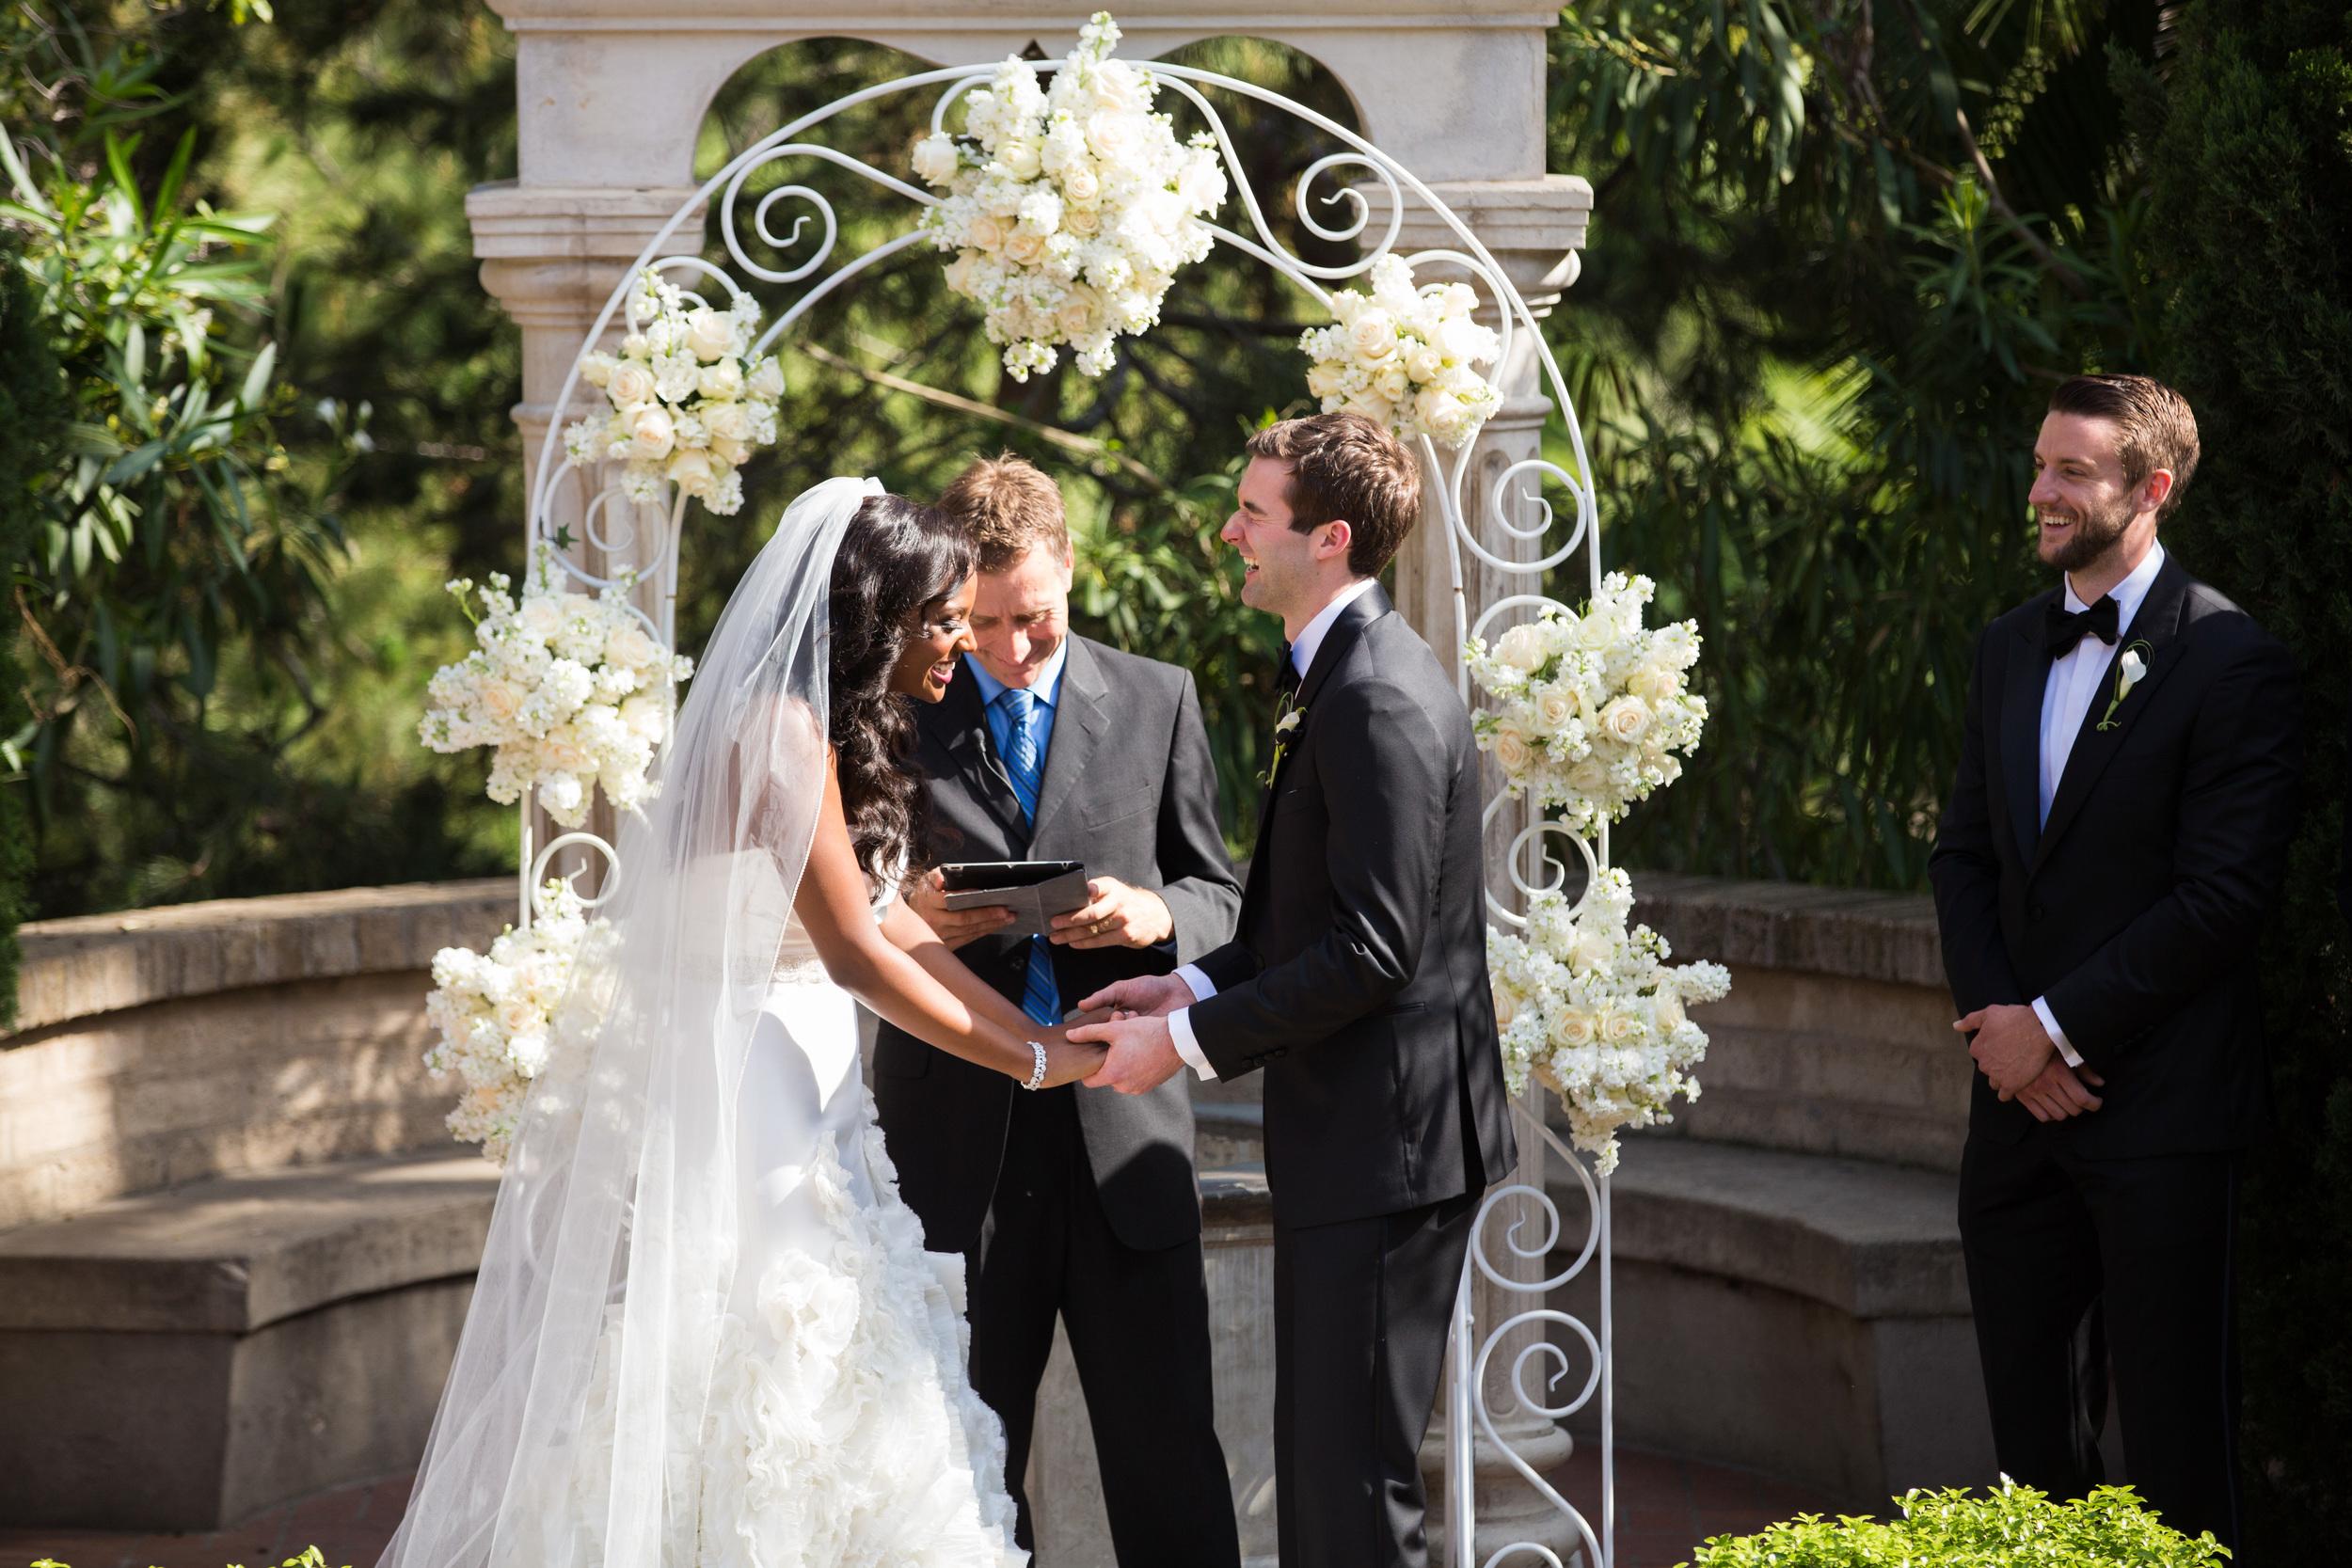 Lindsay & Kanne Ceremony (83 of 115).jpg